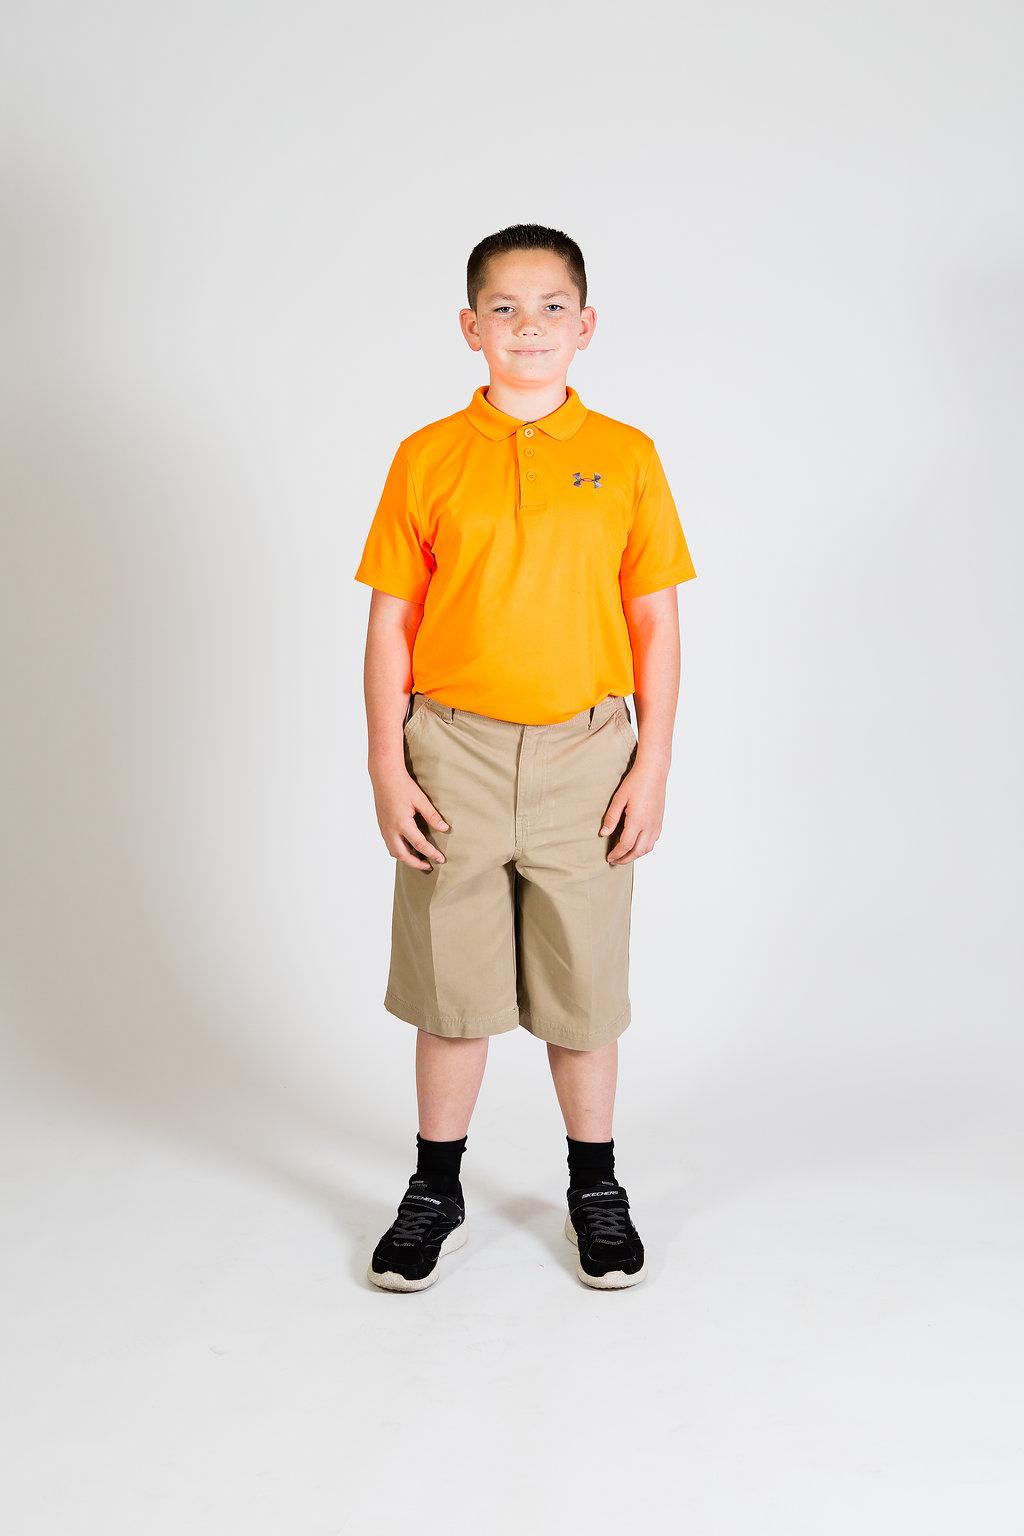 16JuneWCA_Uniforms128-Edit.jpg